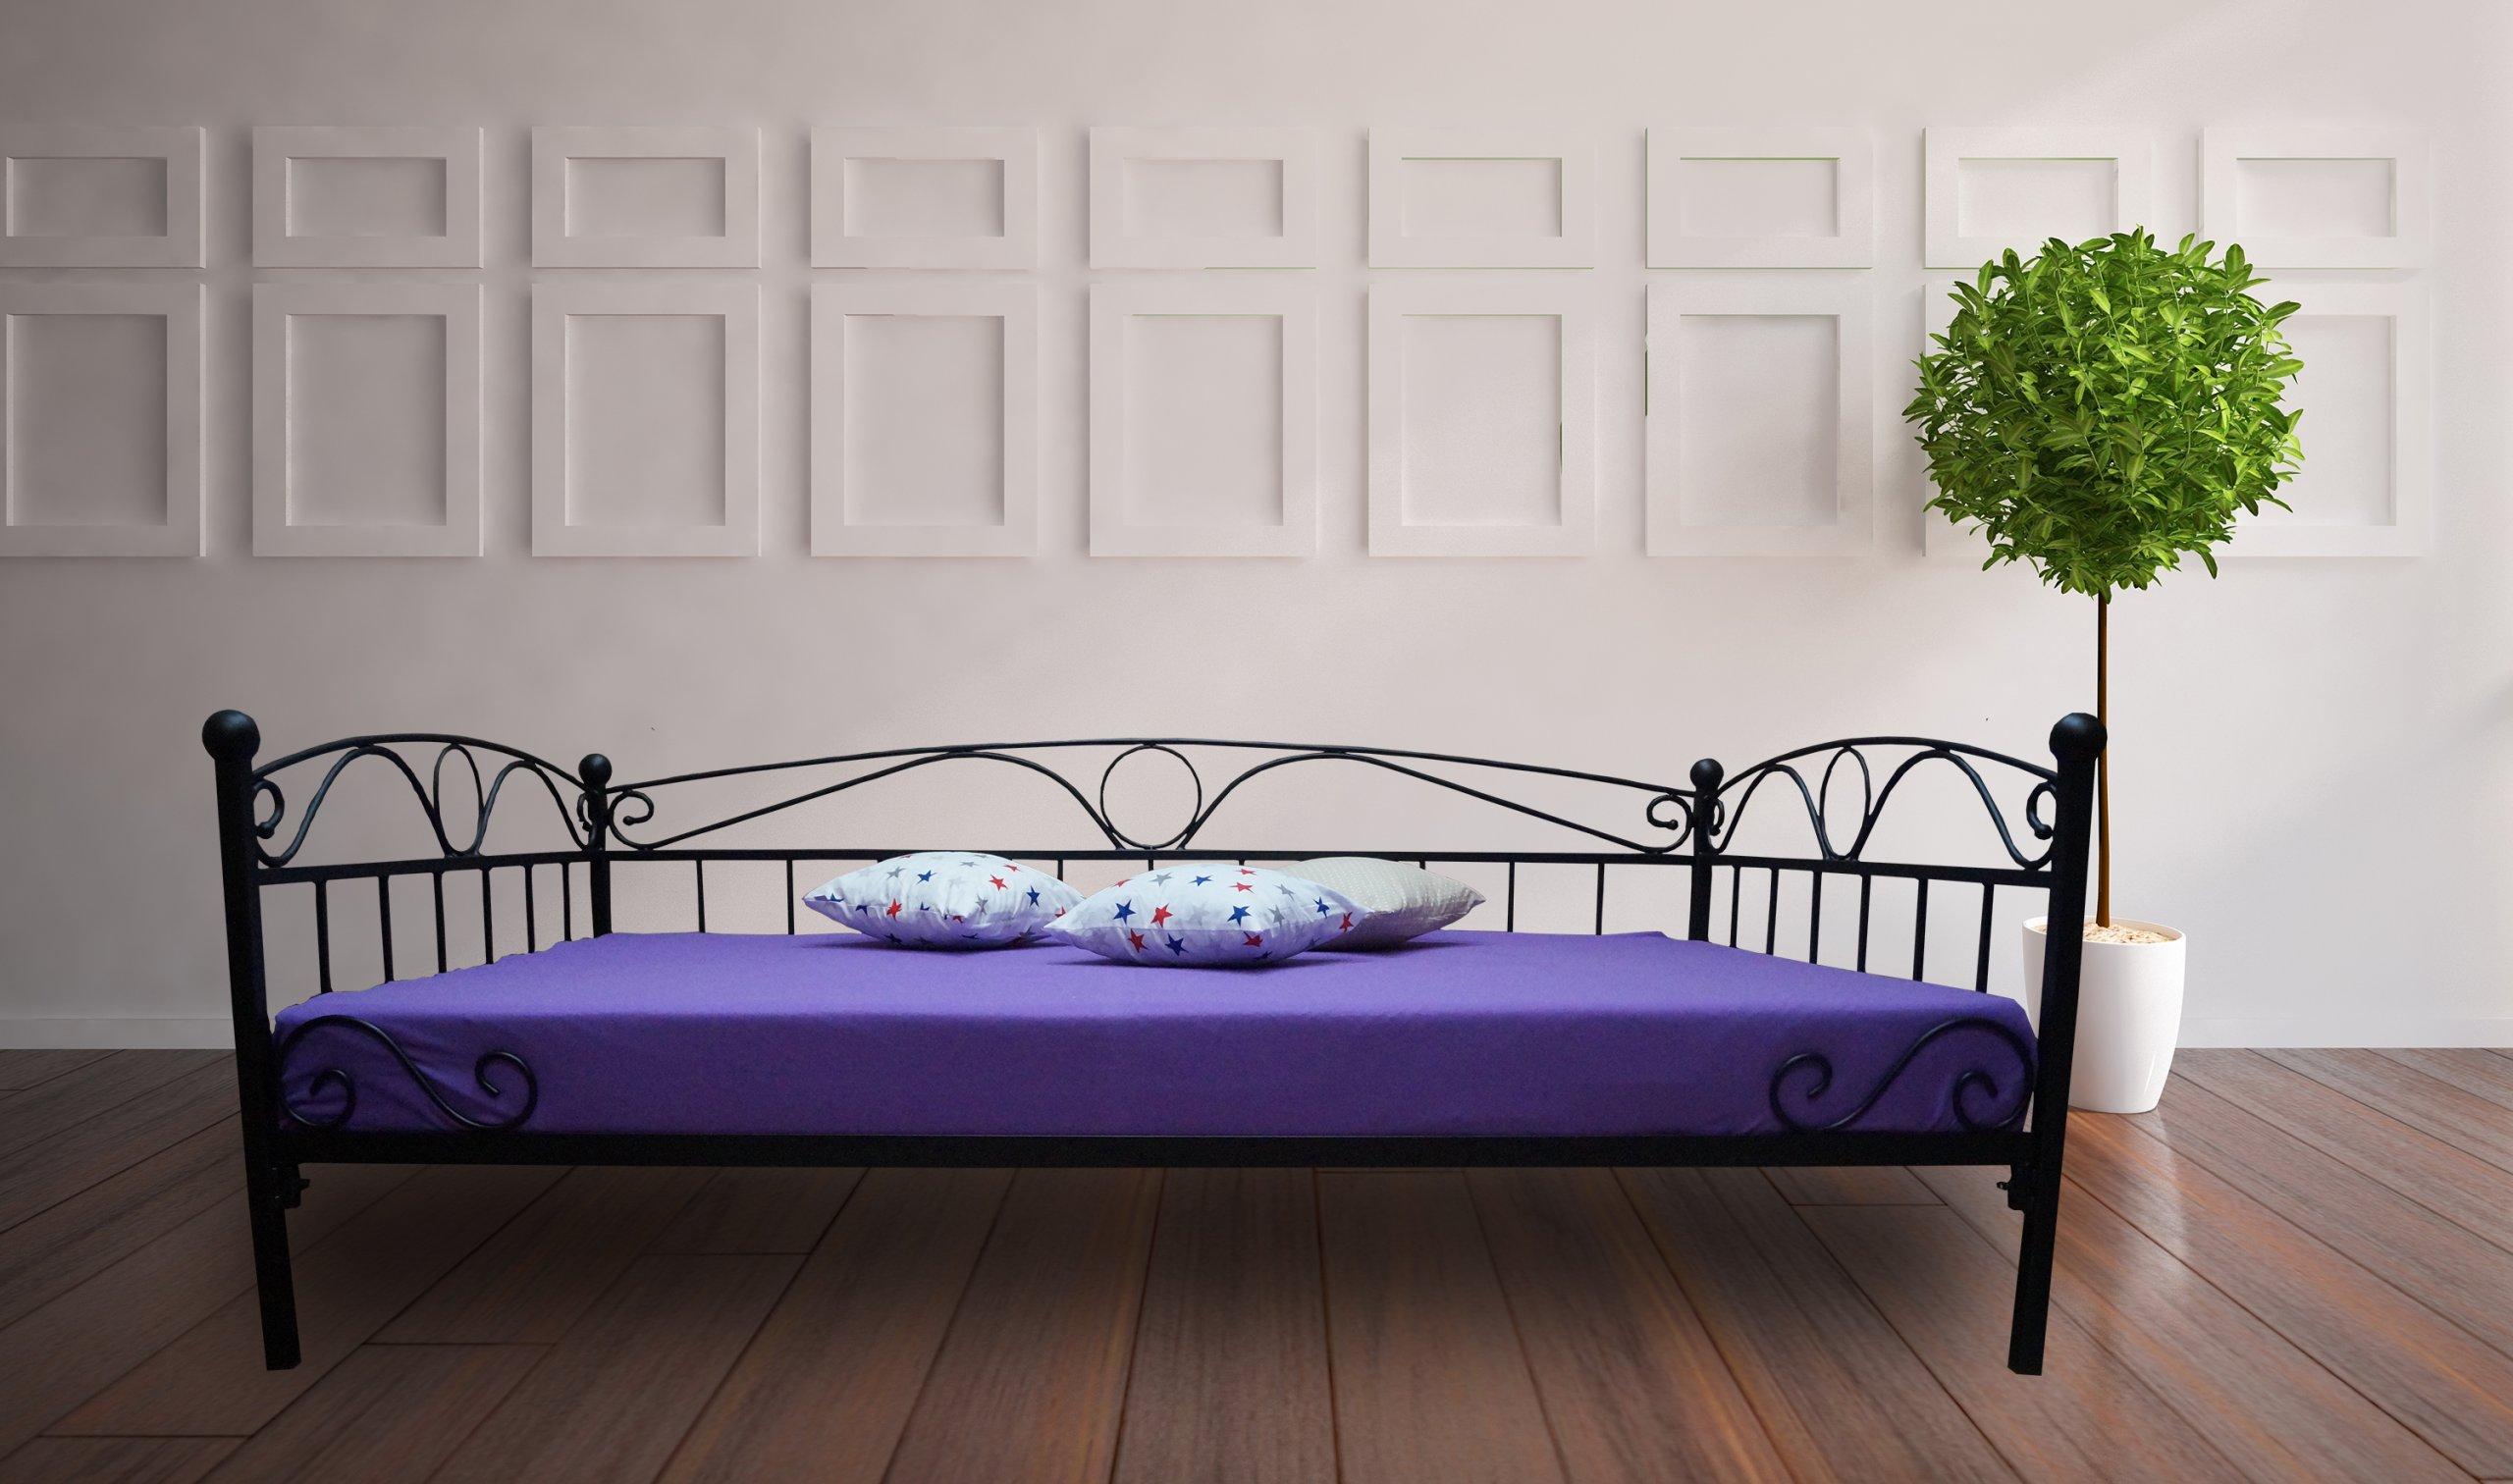 łóżko Metalowe Sofa Sabina 120x200 Kute Nowość 6736383854